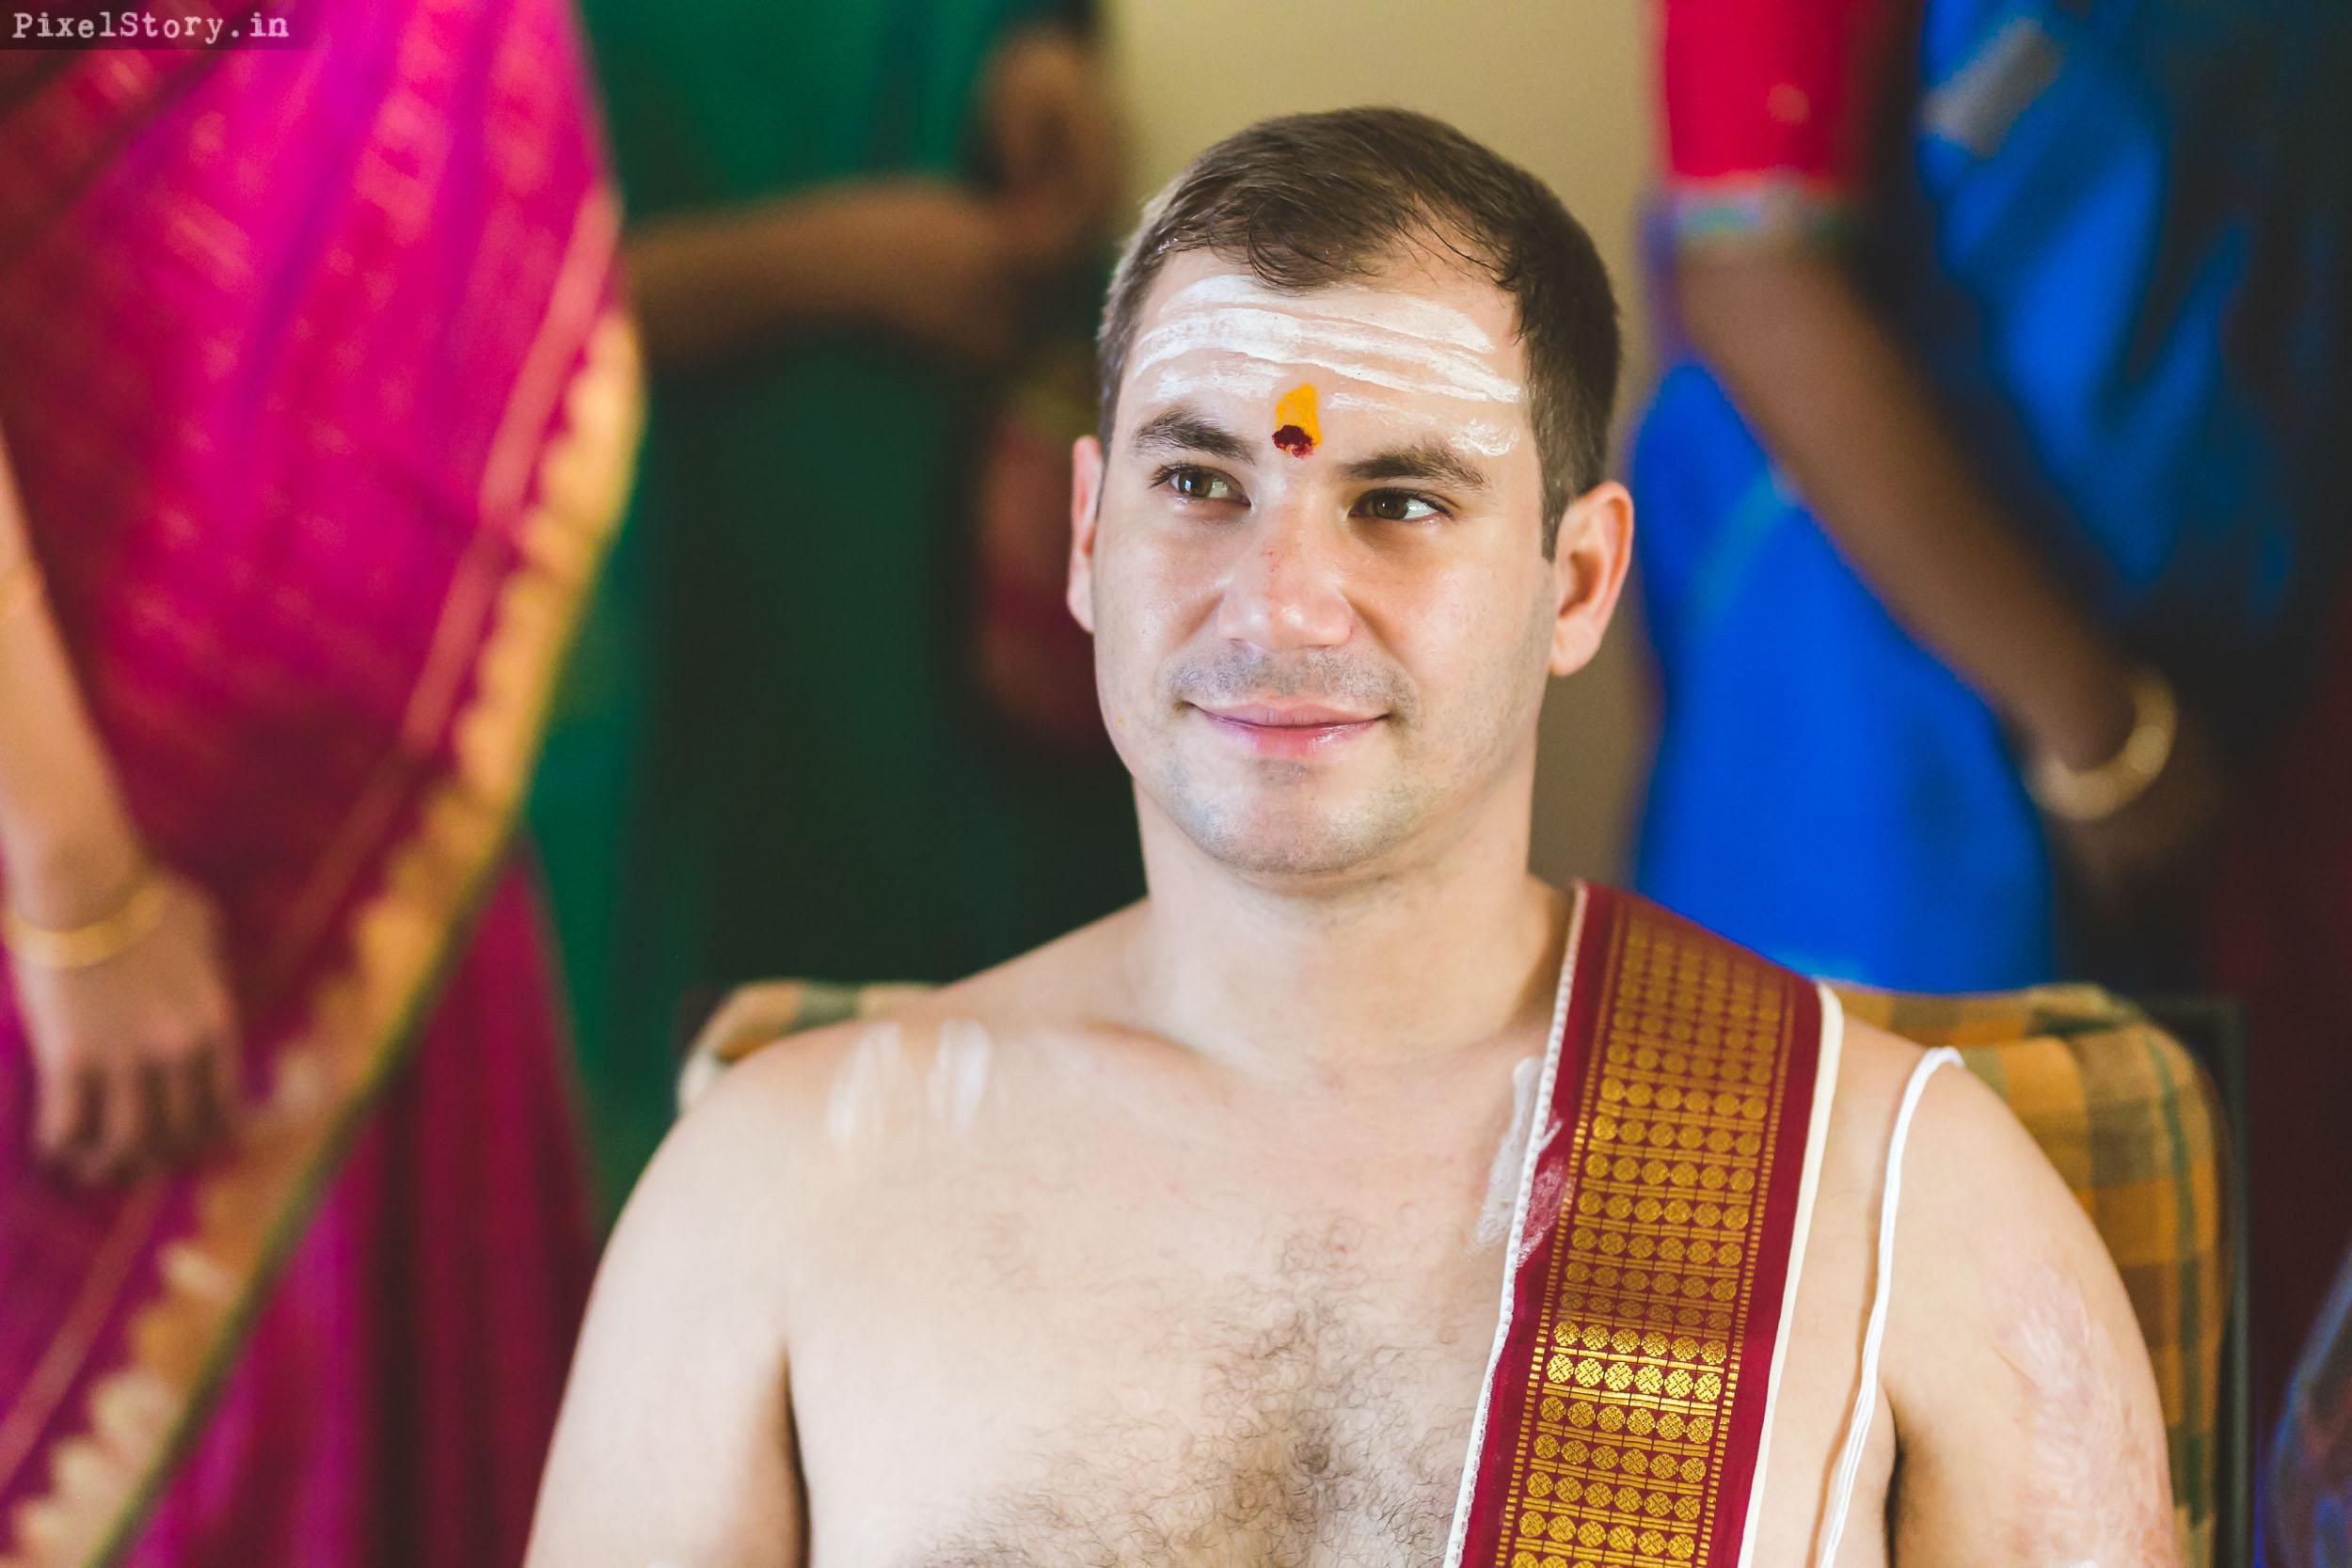 PixelStory-Jungle-Wedding-Photographer-Masinagudi-Indo-French023.jpg